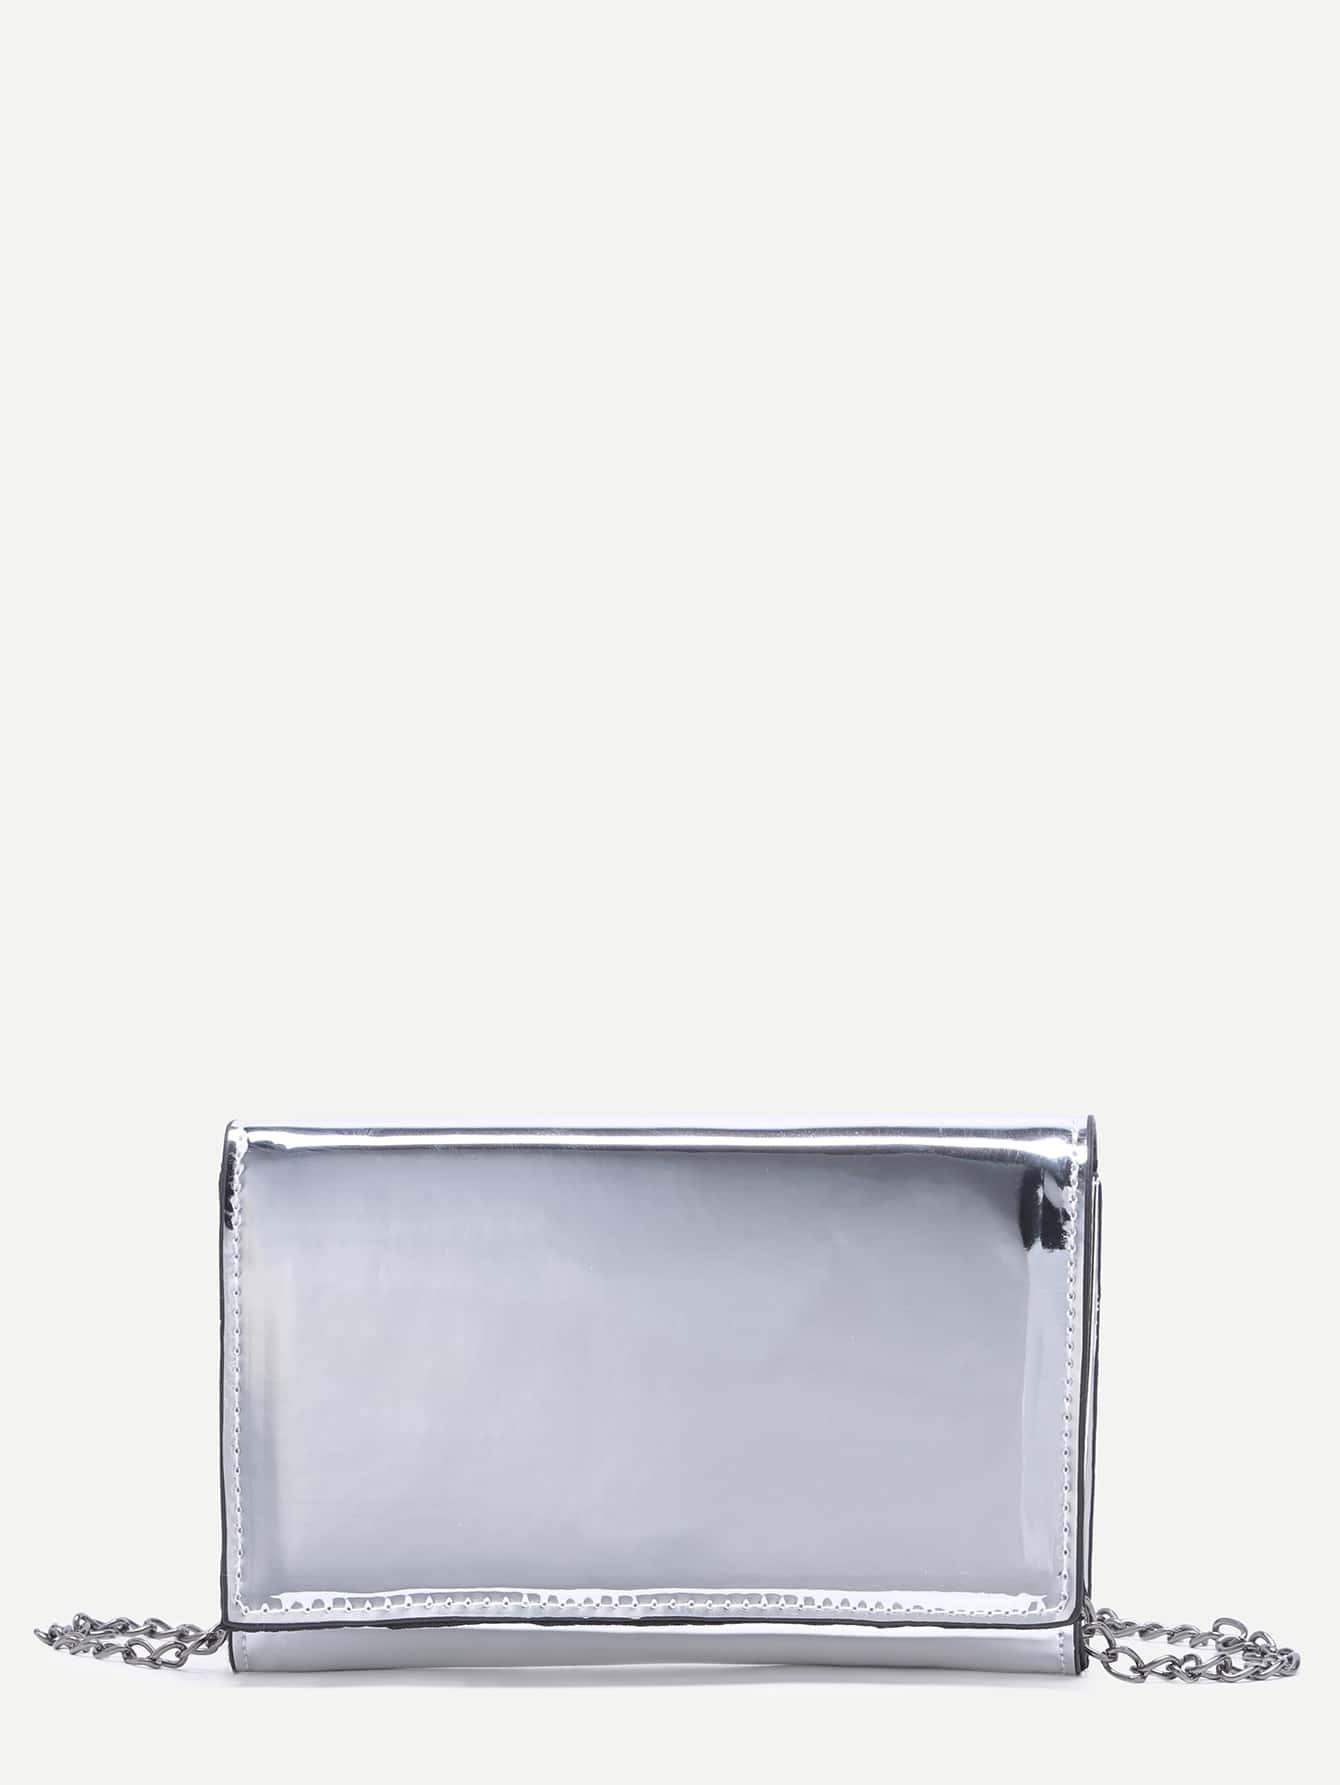 bag161024305_2